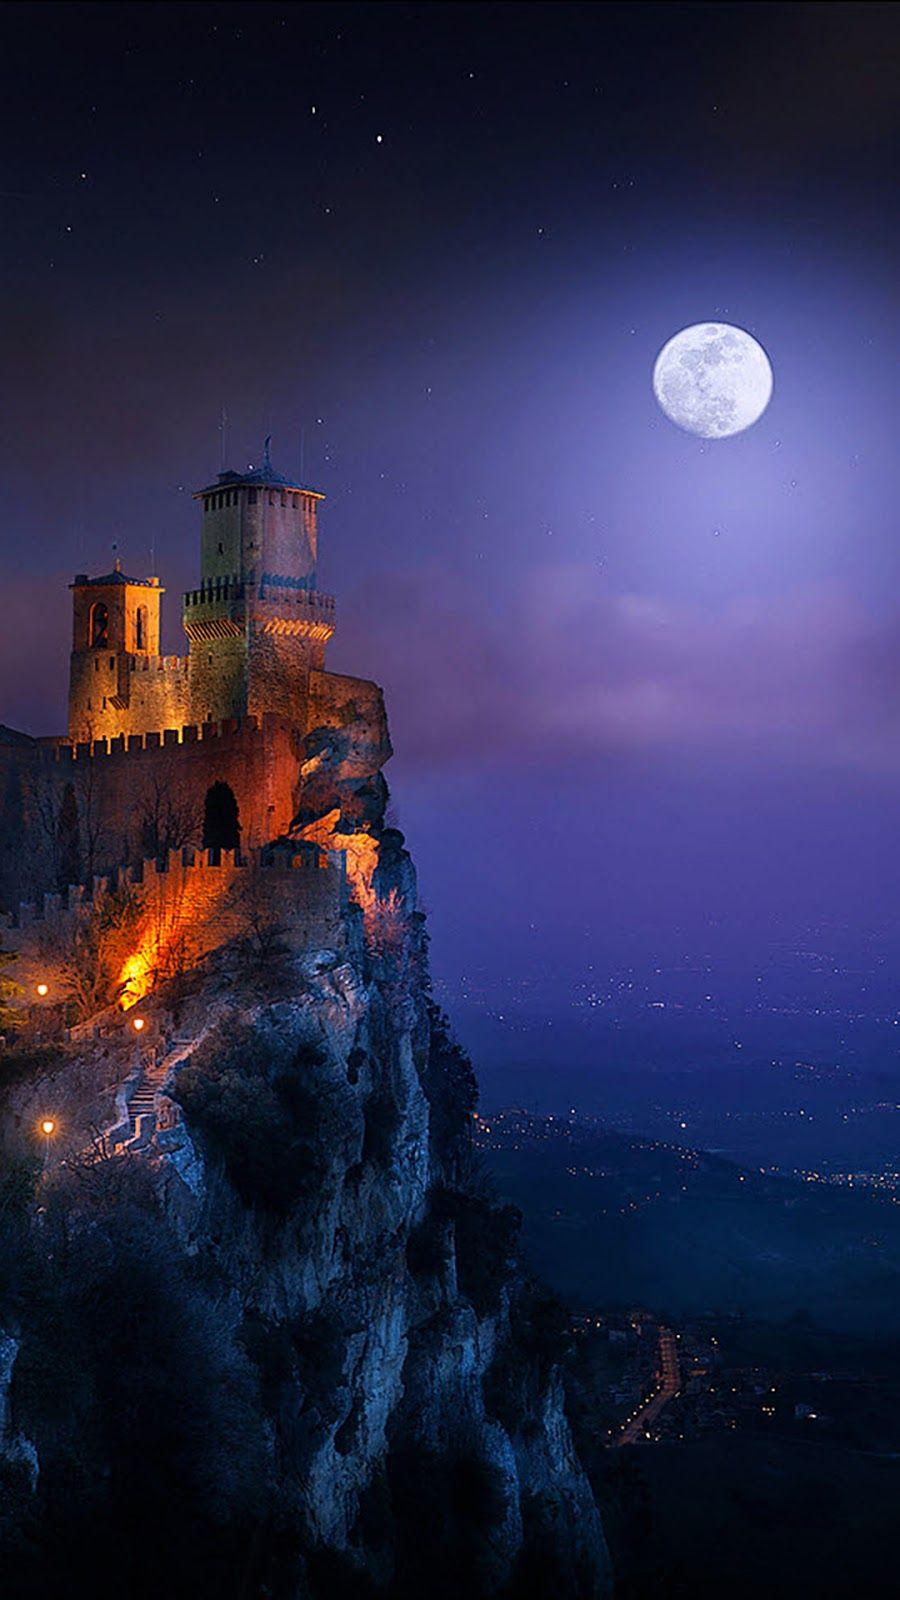 Night of the full moon Night sky wallpaper, Iphone